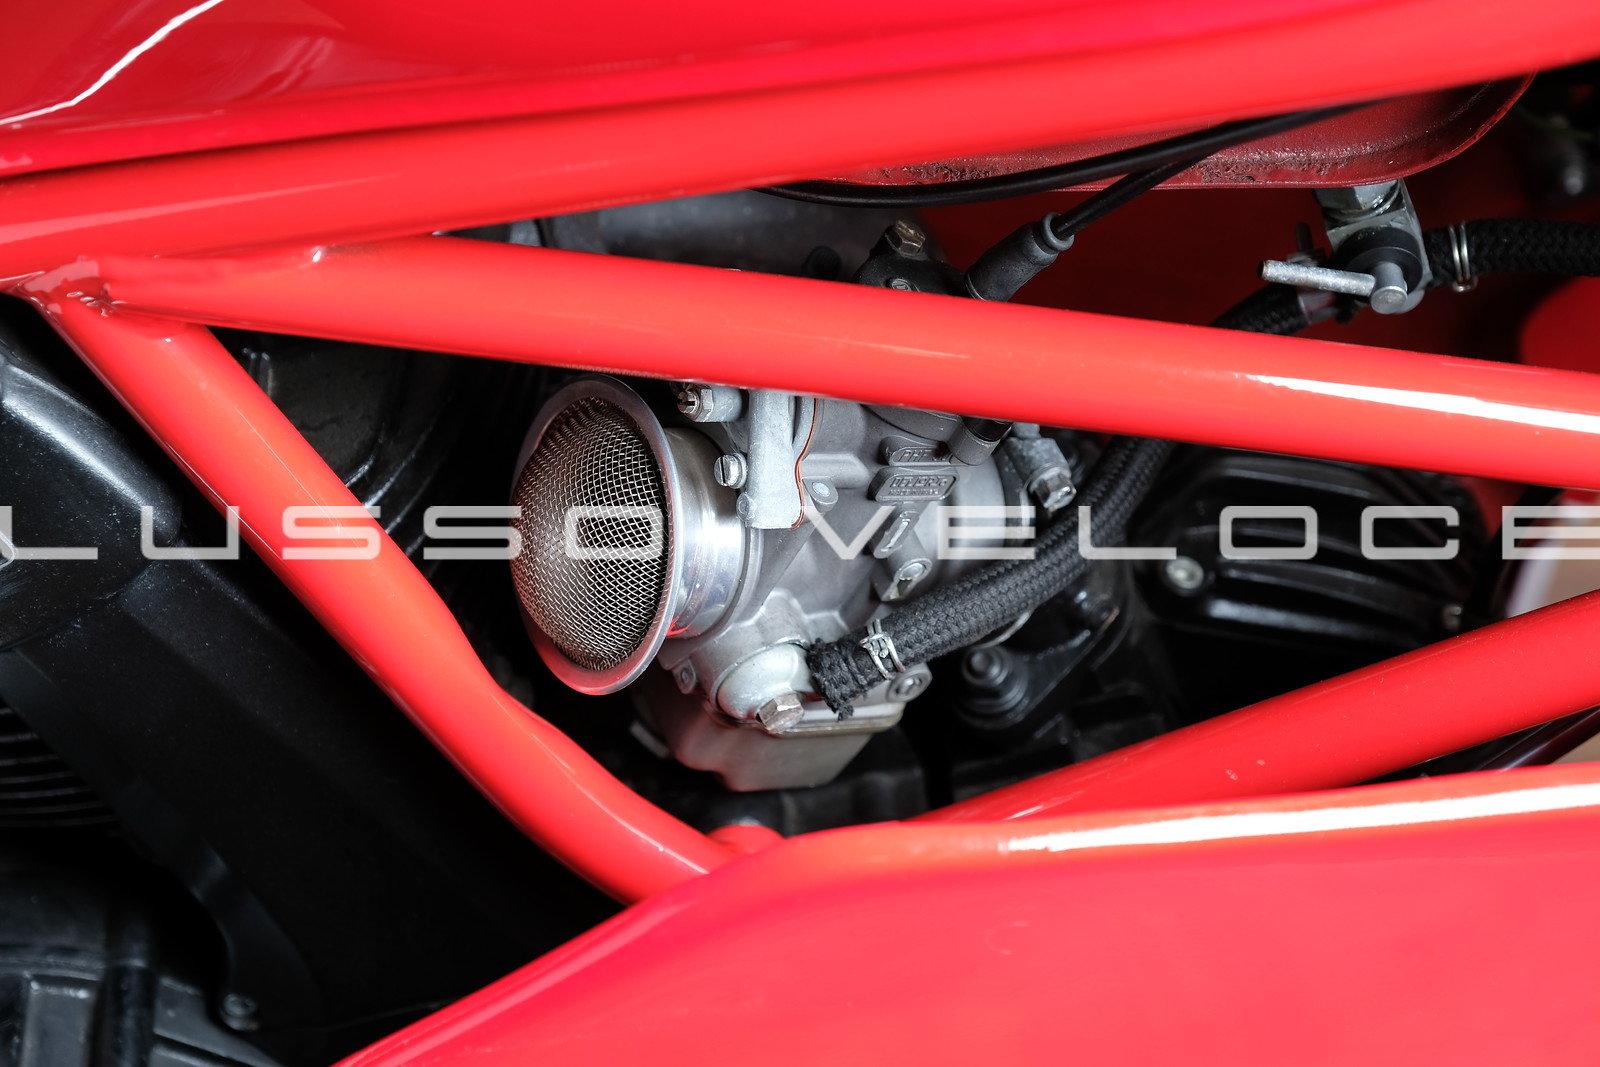 1986 Rare Ducati F3 350 fully restored For Sale (picture 6 of 15)